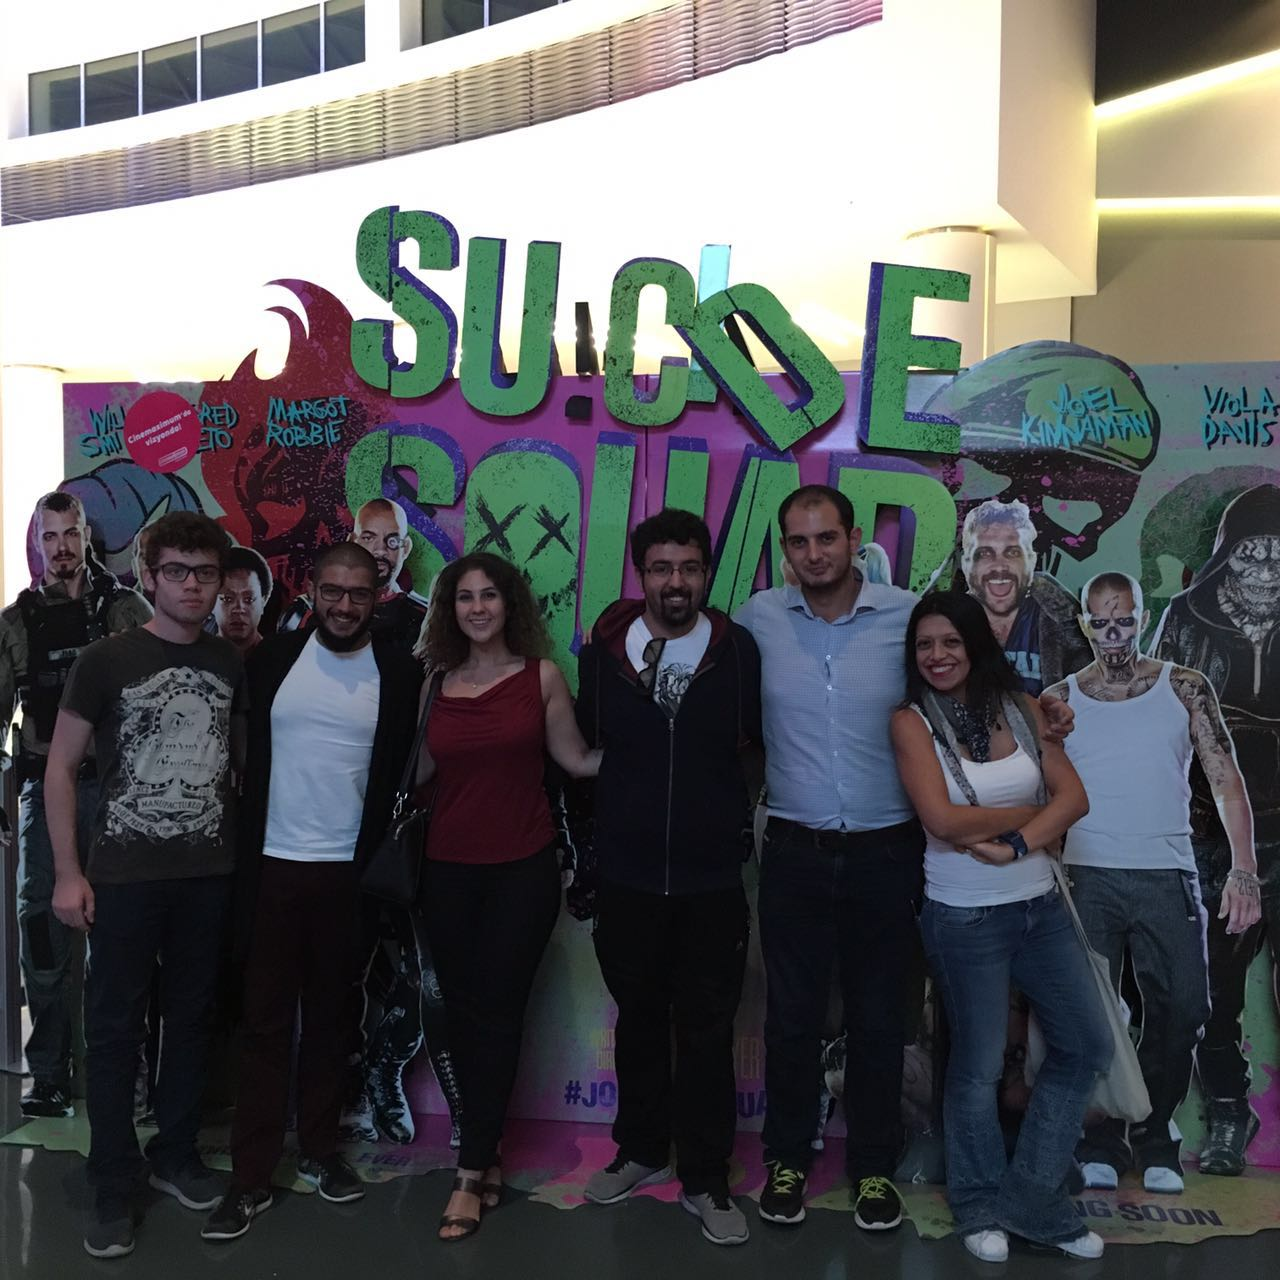 13.08.2016 / Kulüp İçi Sinema Organizasyonu [Suicide Squad]